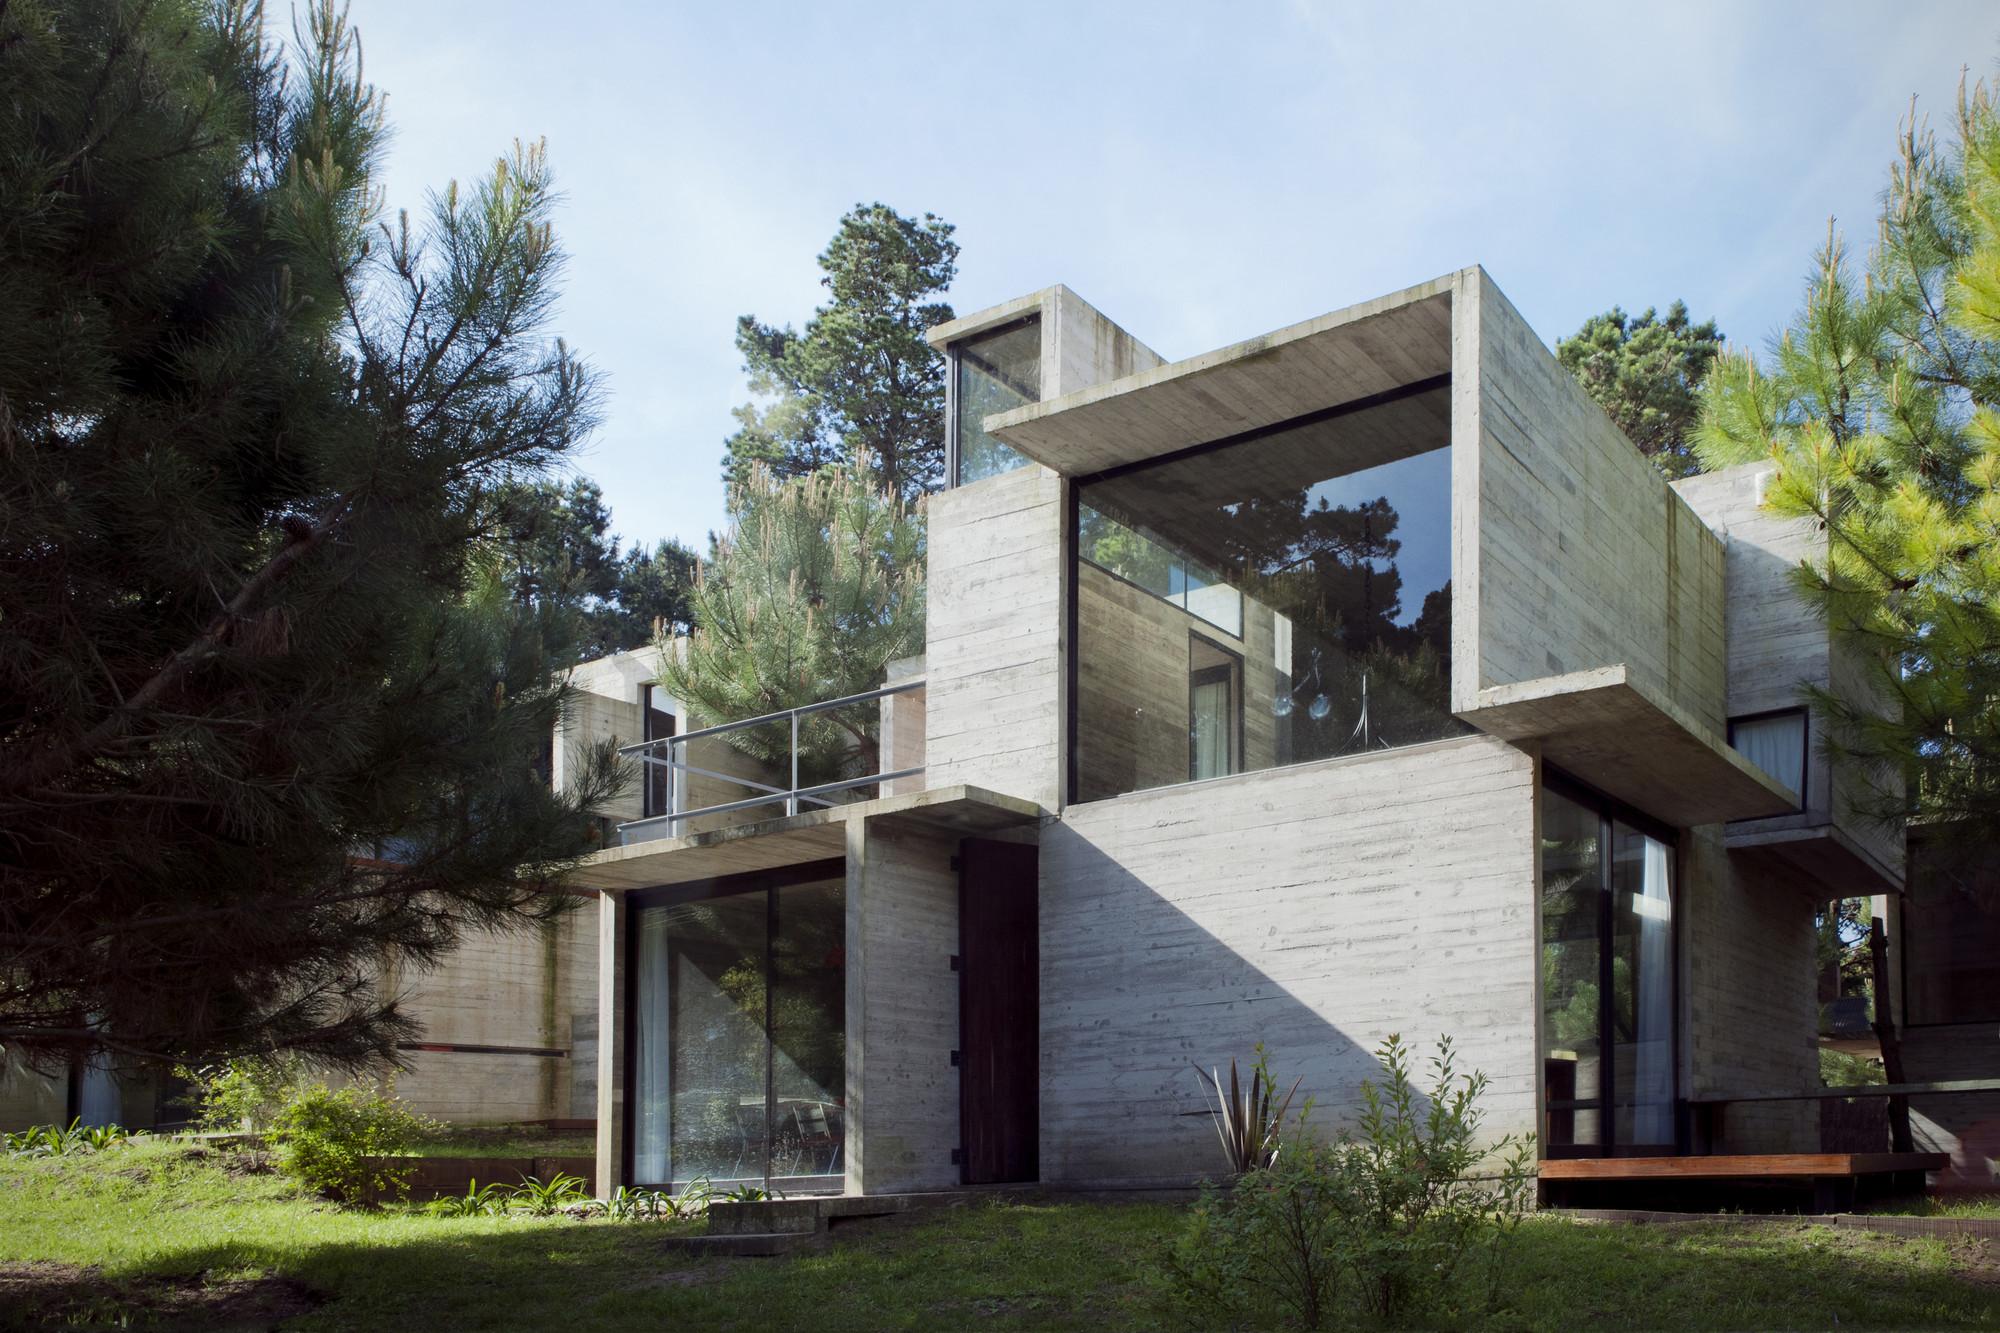 Complexo V+D / BAK arquitectos, © Inés Tanoira